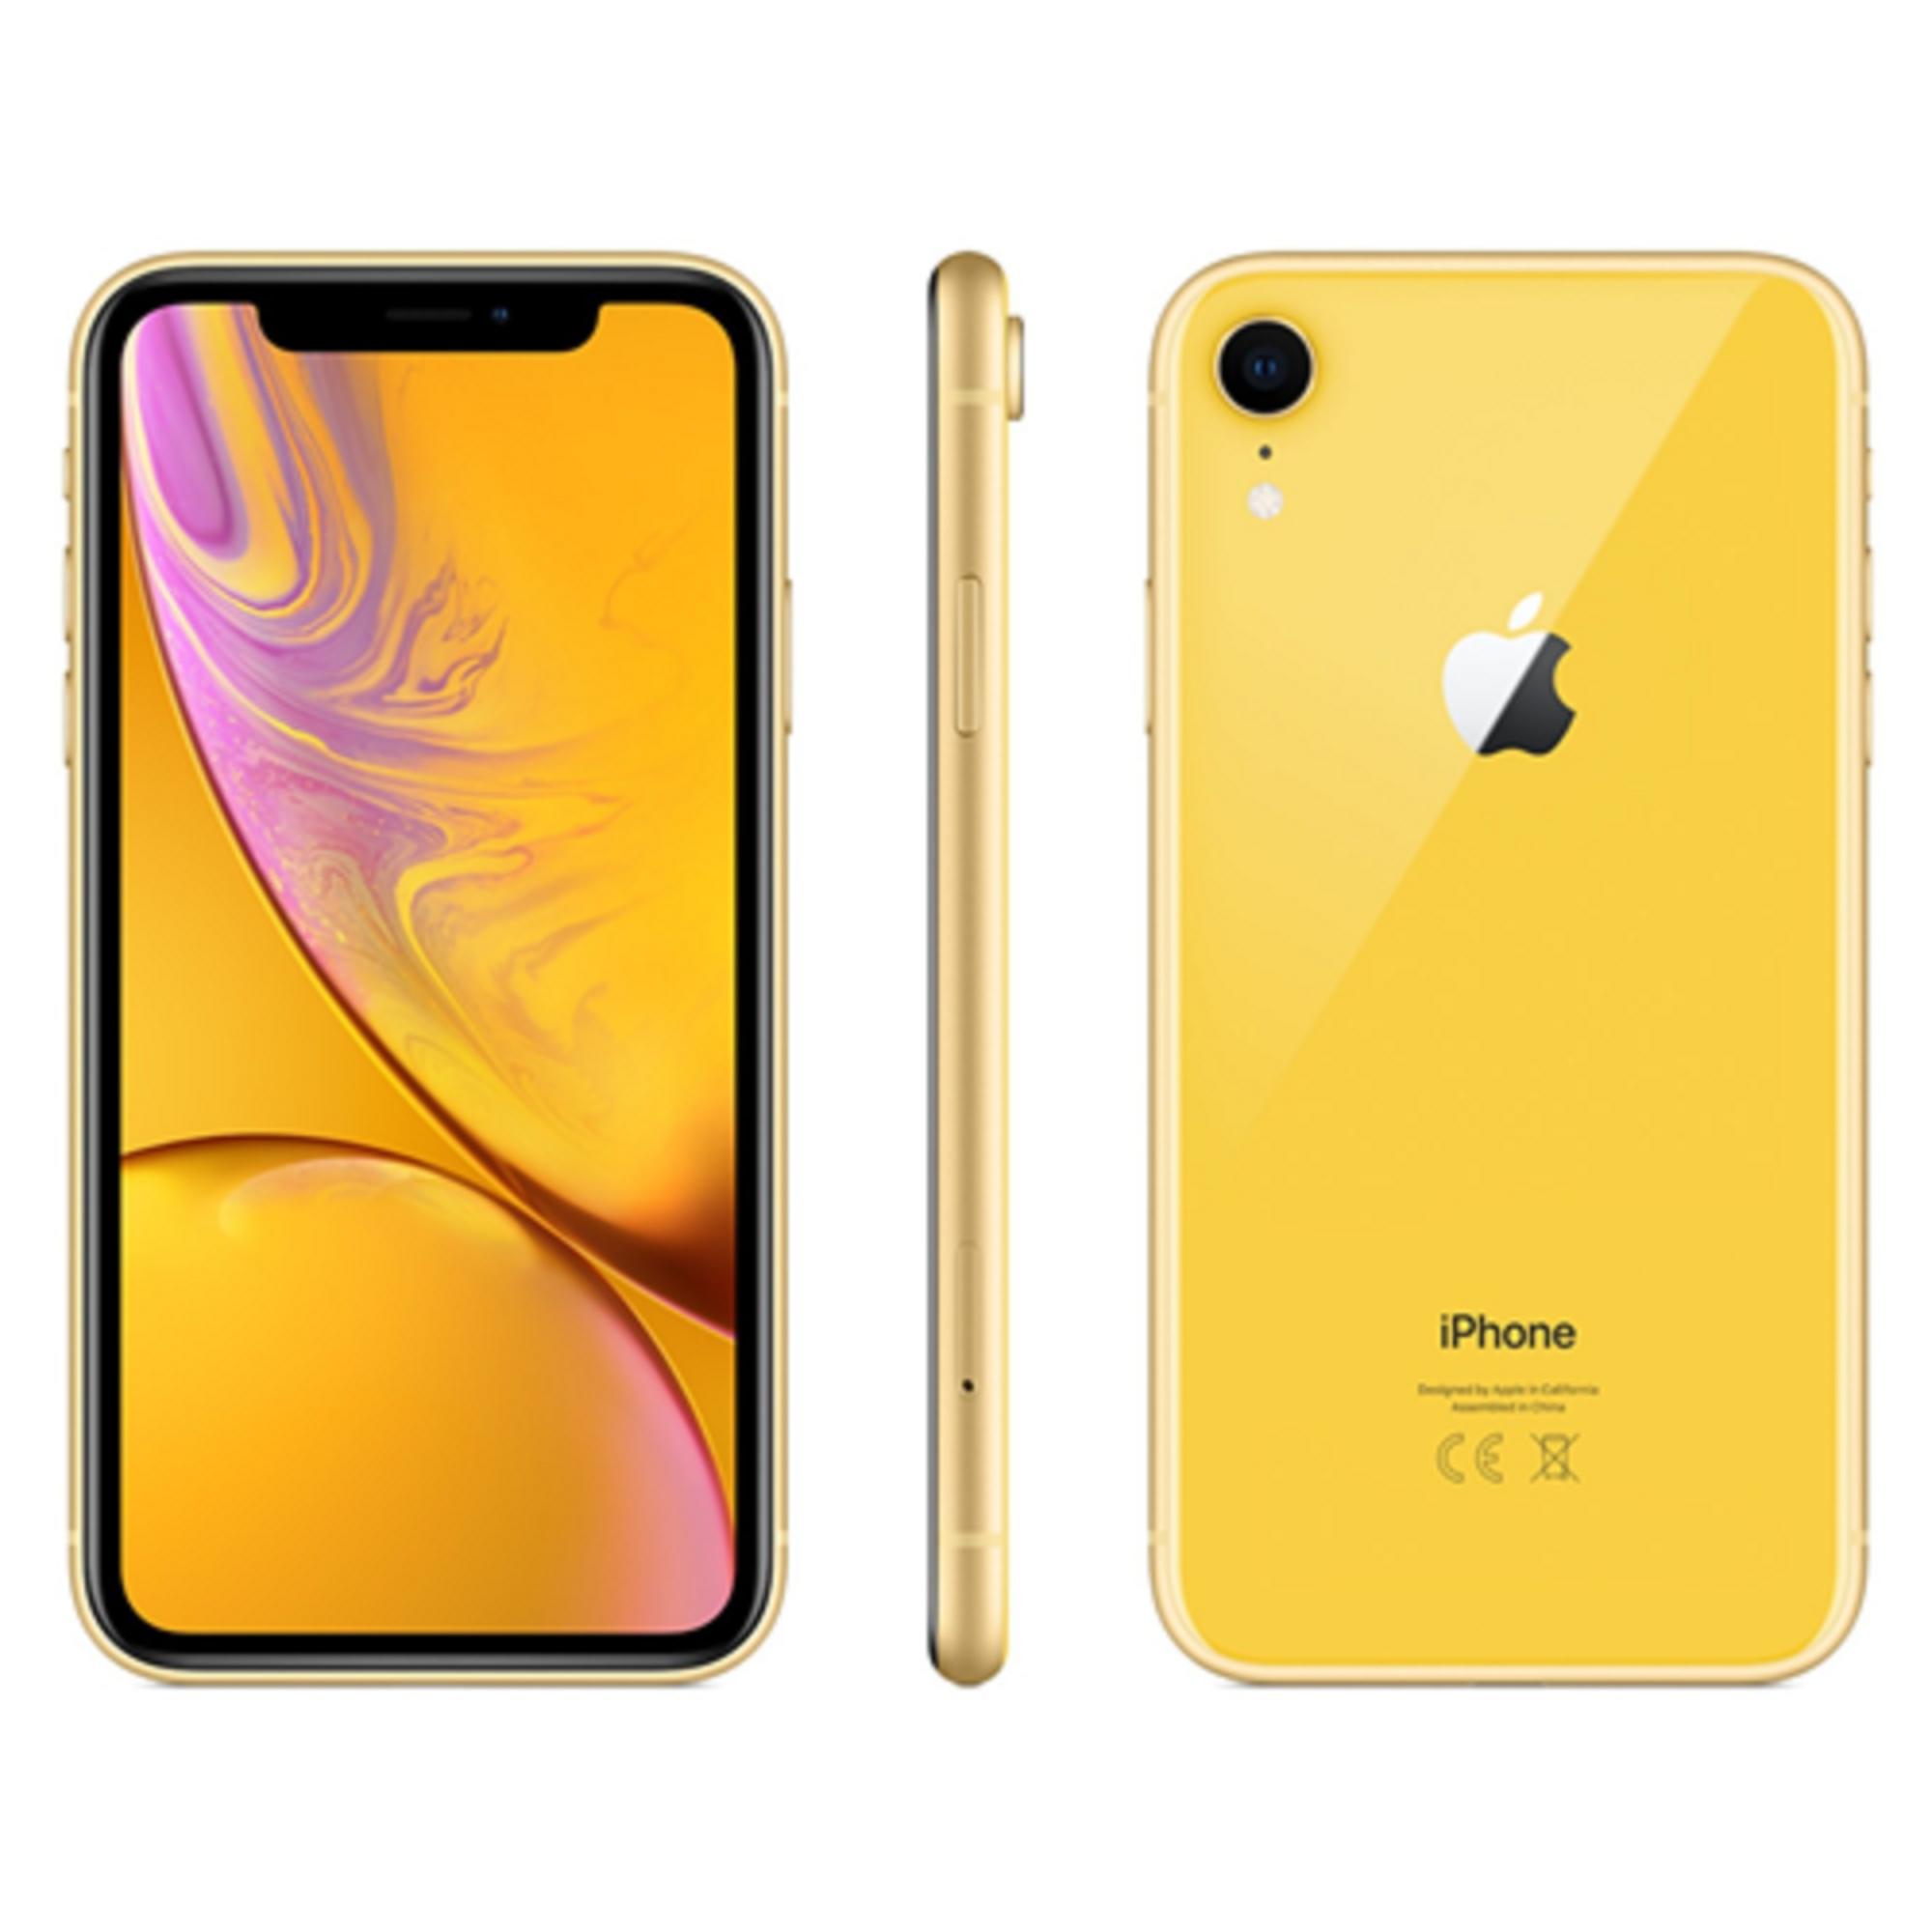 thumbnail 25 - Apple iPhone XR 64GB Factory Unlocked Smartphone 4G LTE iOS Smartphone - Very